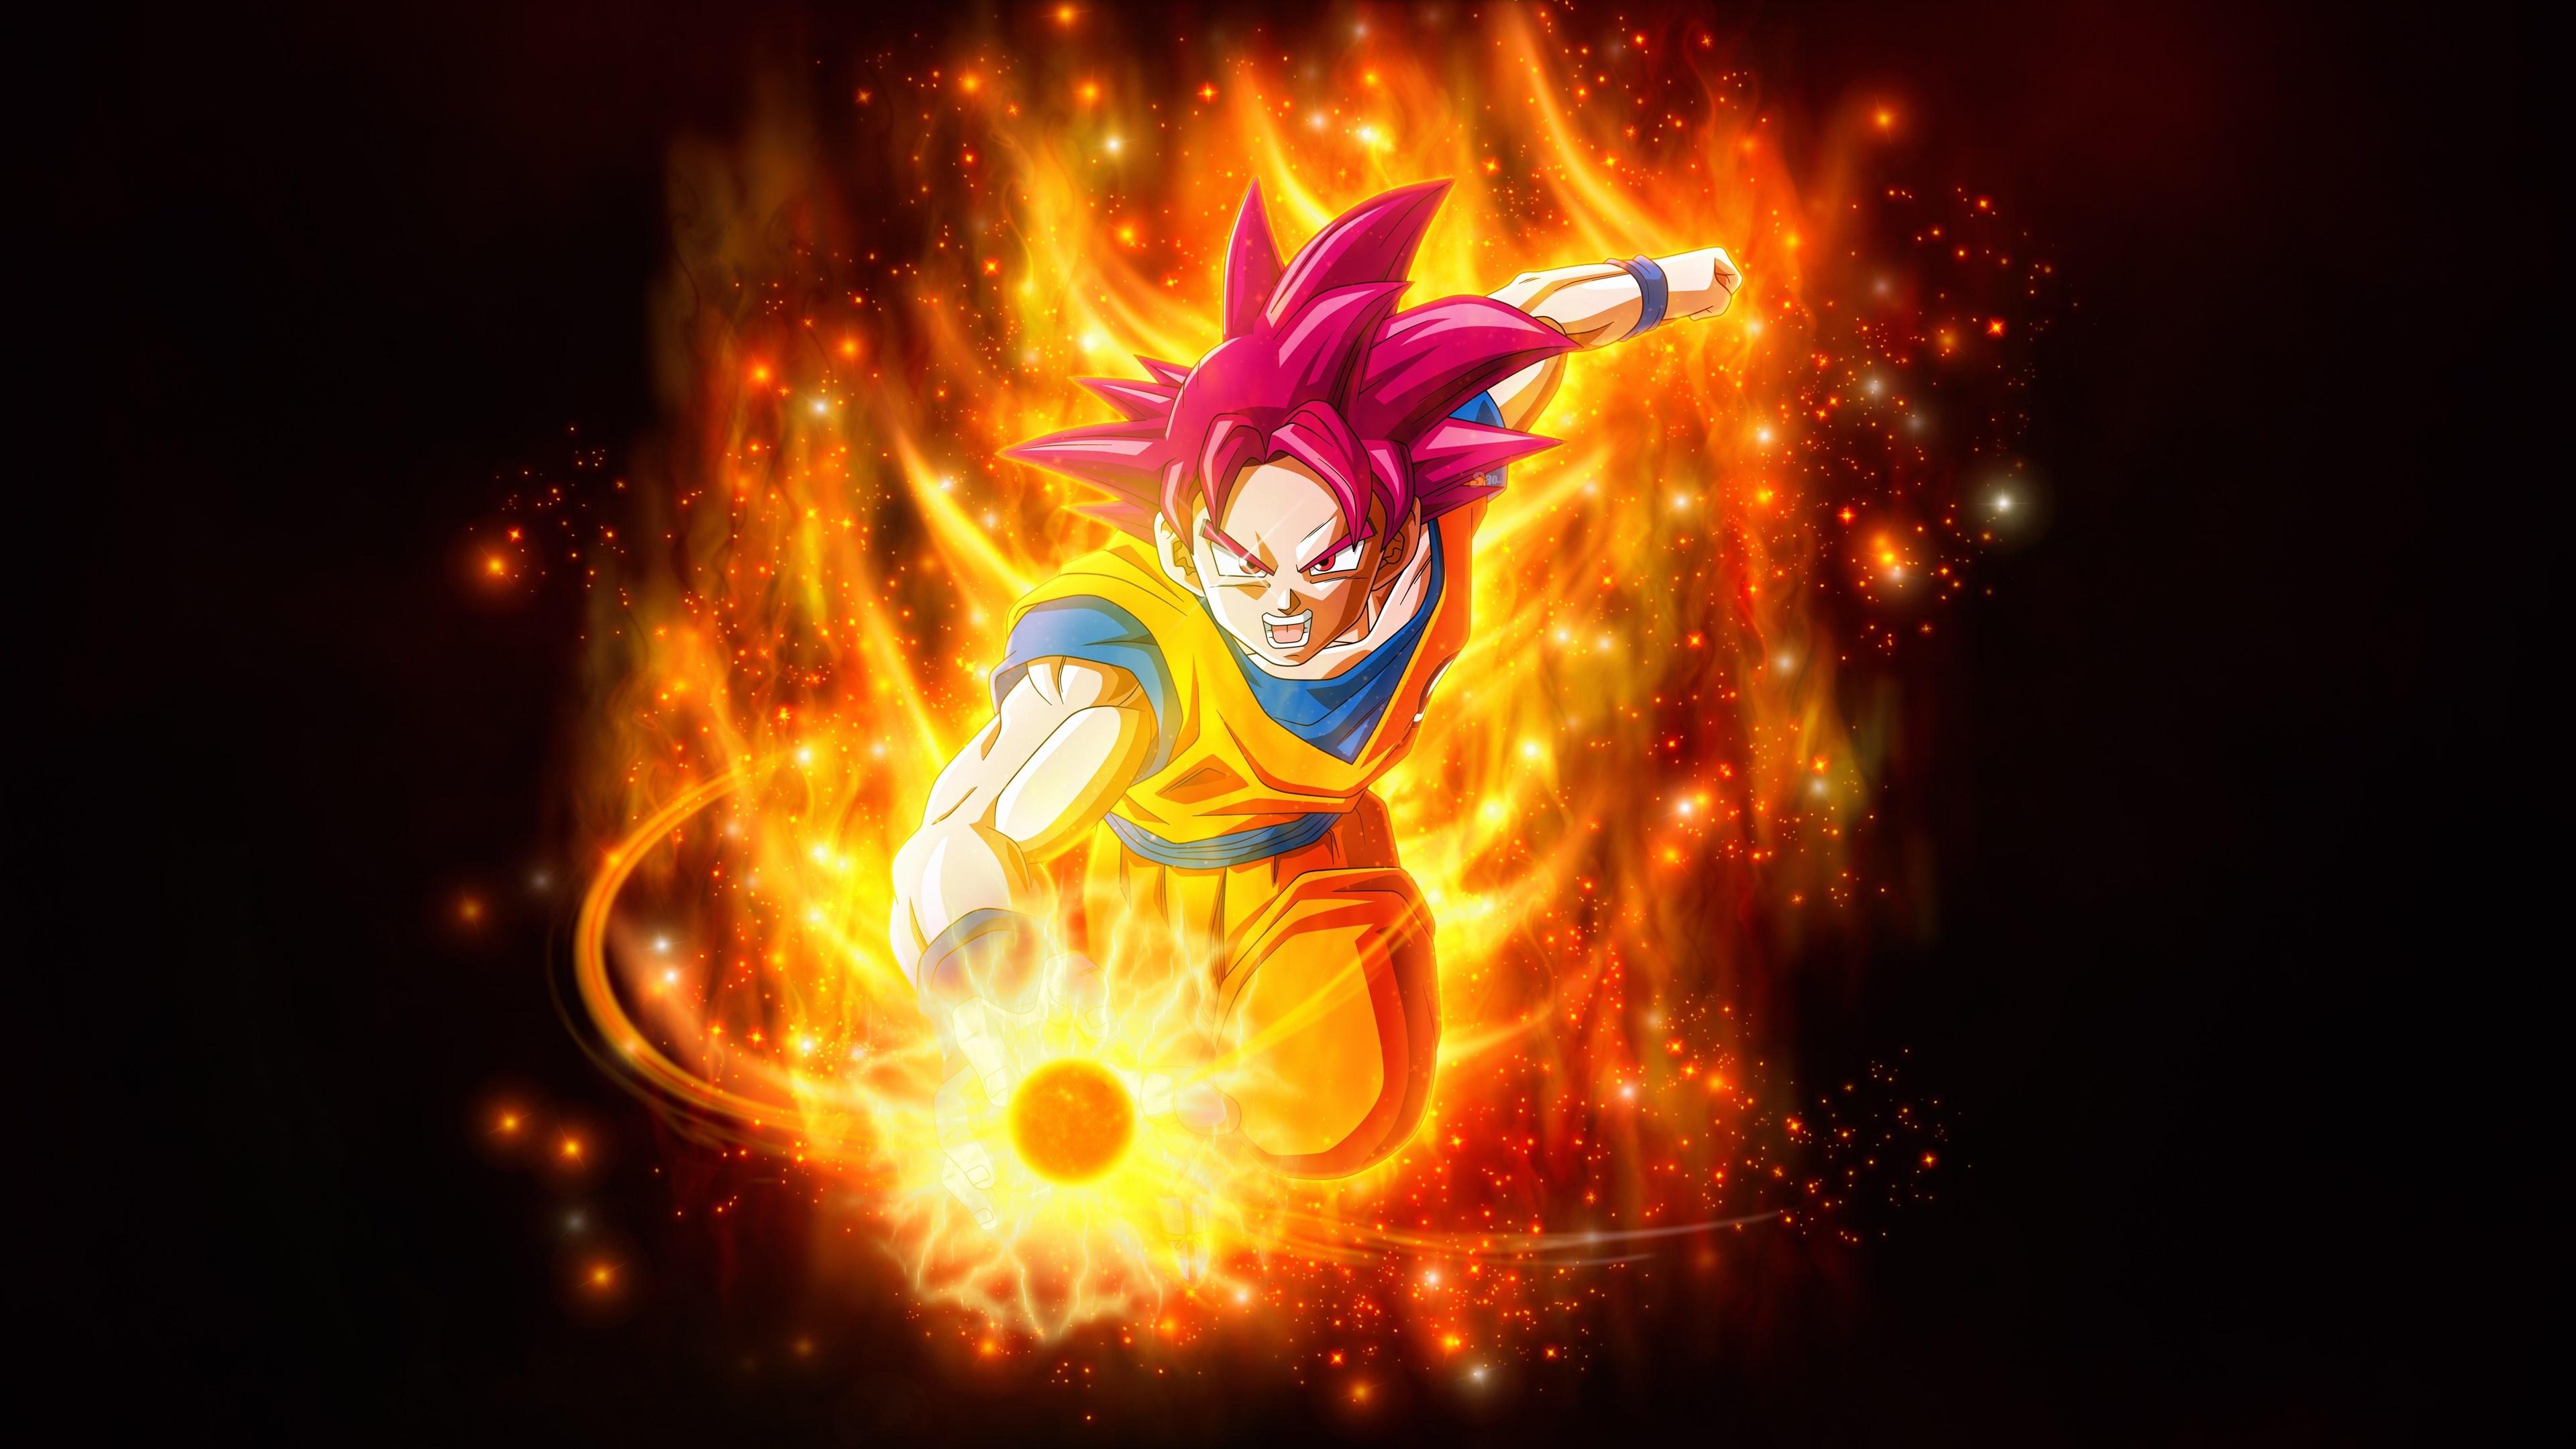 Goku 3840x2160 wallpaper